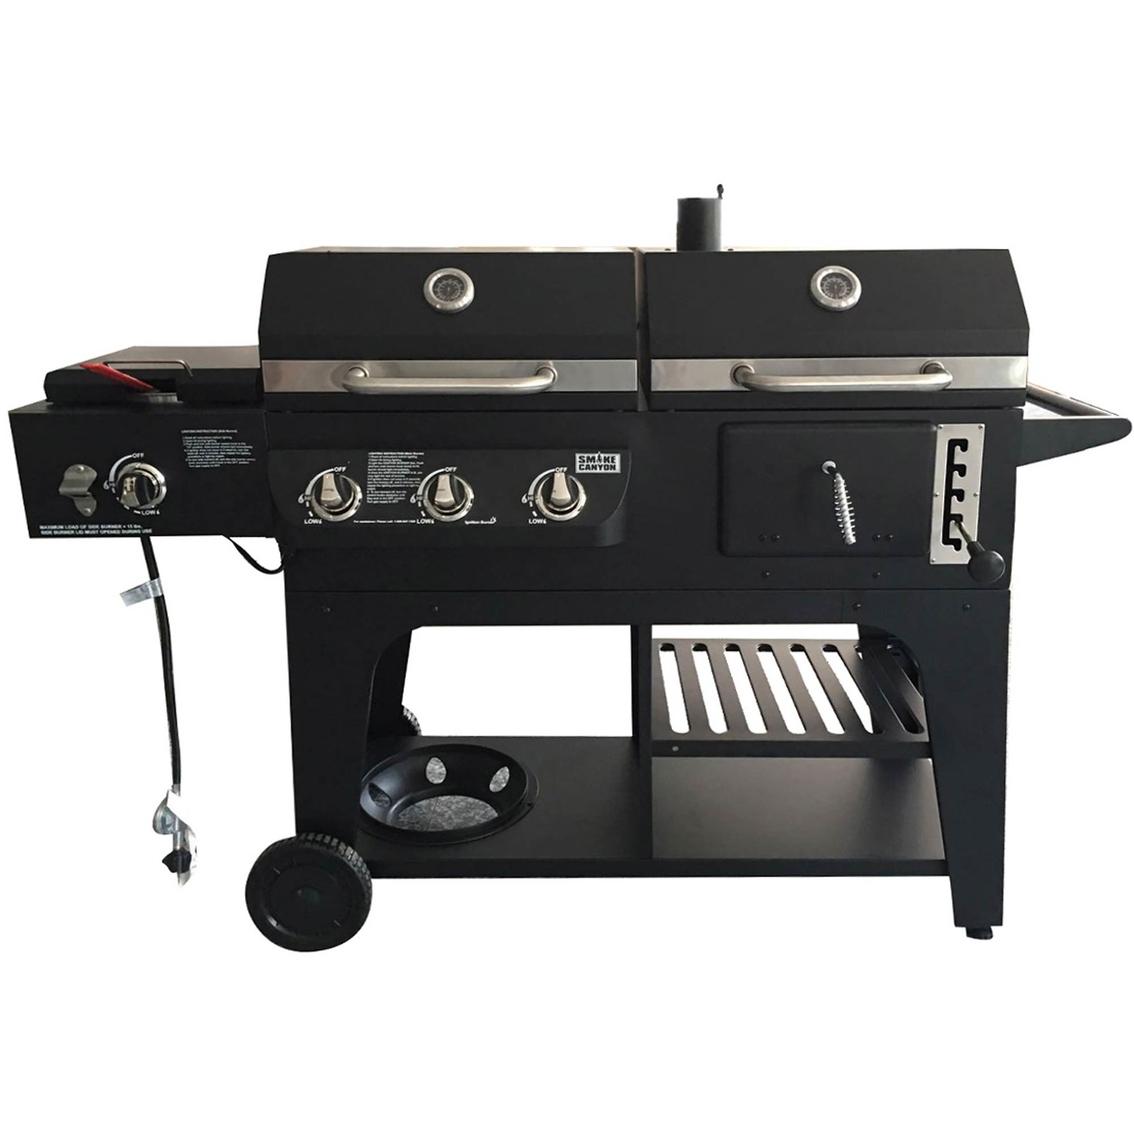 Smoke Canyon Hybrid Grill